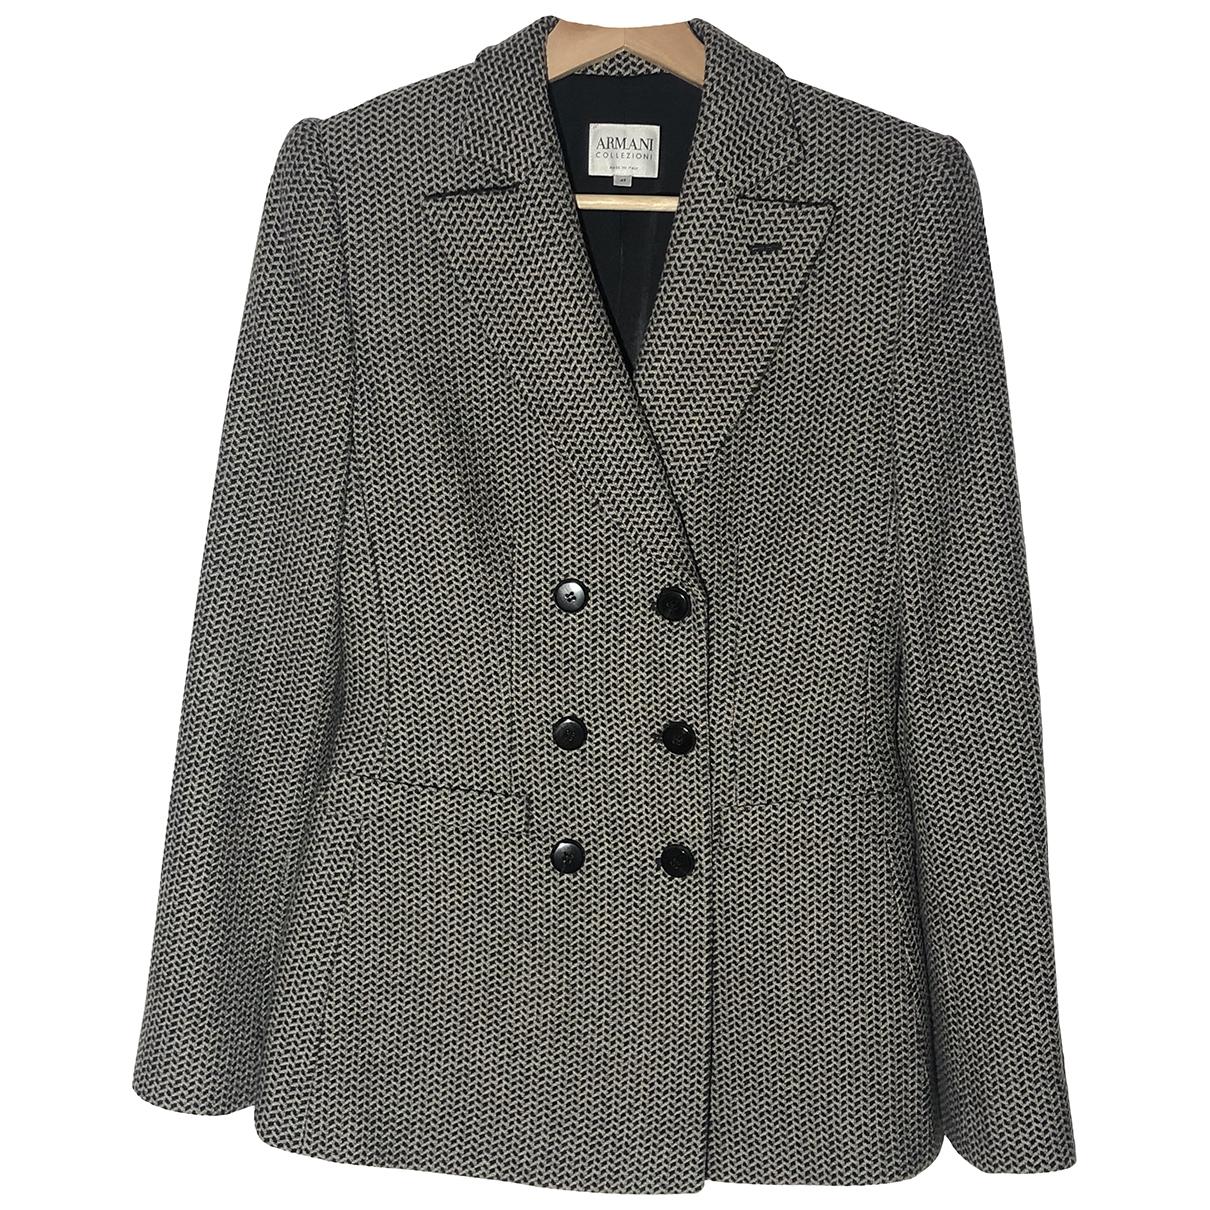 Armani Collezioni \N Multicolour Wool jacket for Women 42 IT